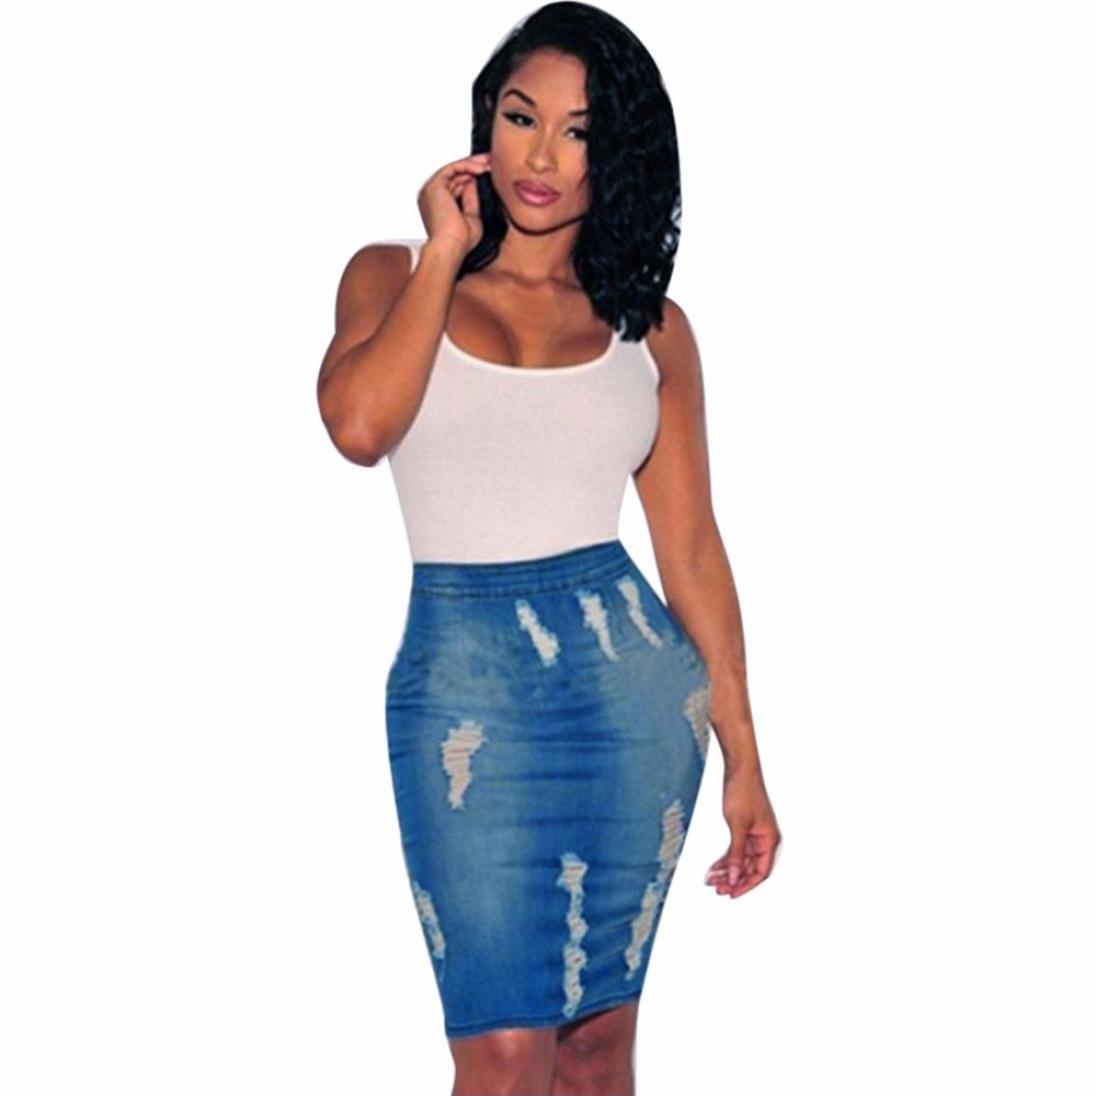 RTYou New Style Women Stretch Bodycon Pencil Skirt High Waisted Hole Denim Jeans Short Mini Skirt (Blue, M)